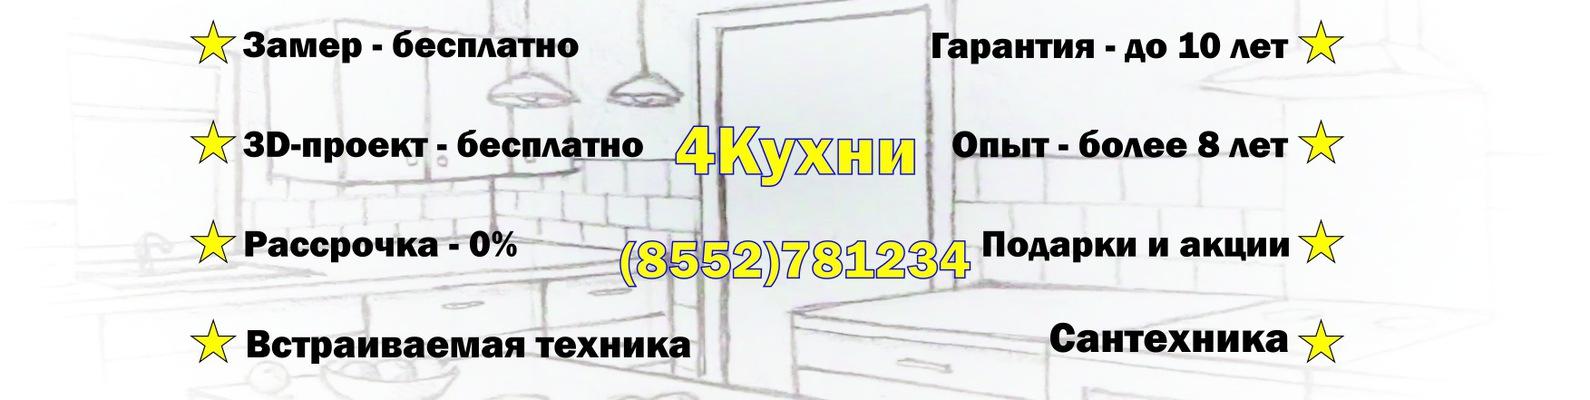 Кухни Челны, Казань | ВКонтакте